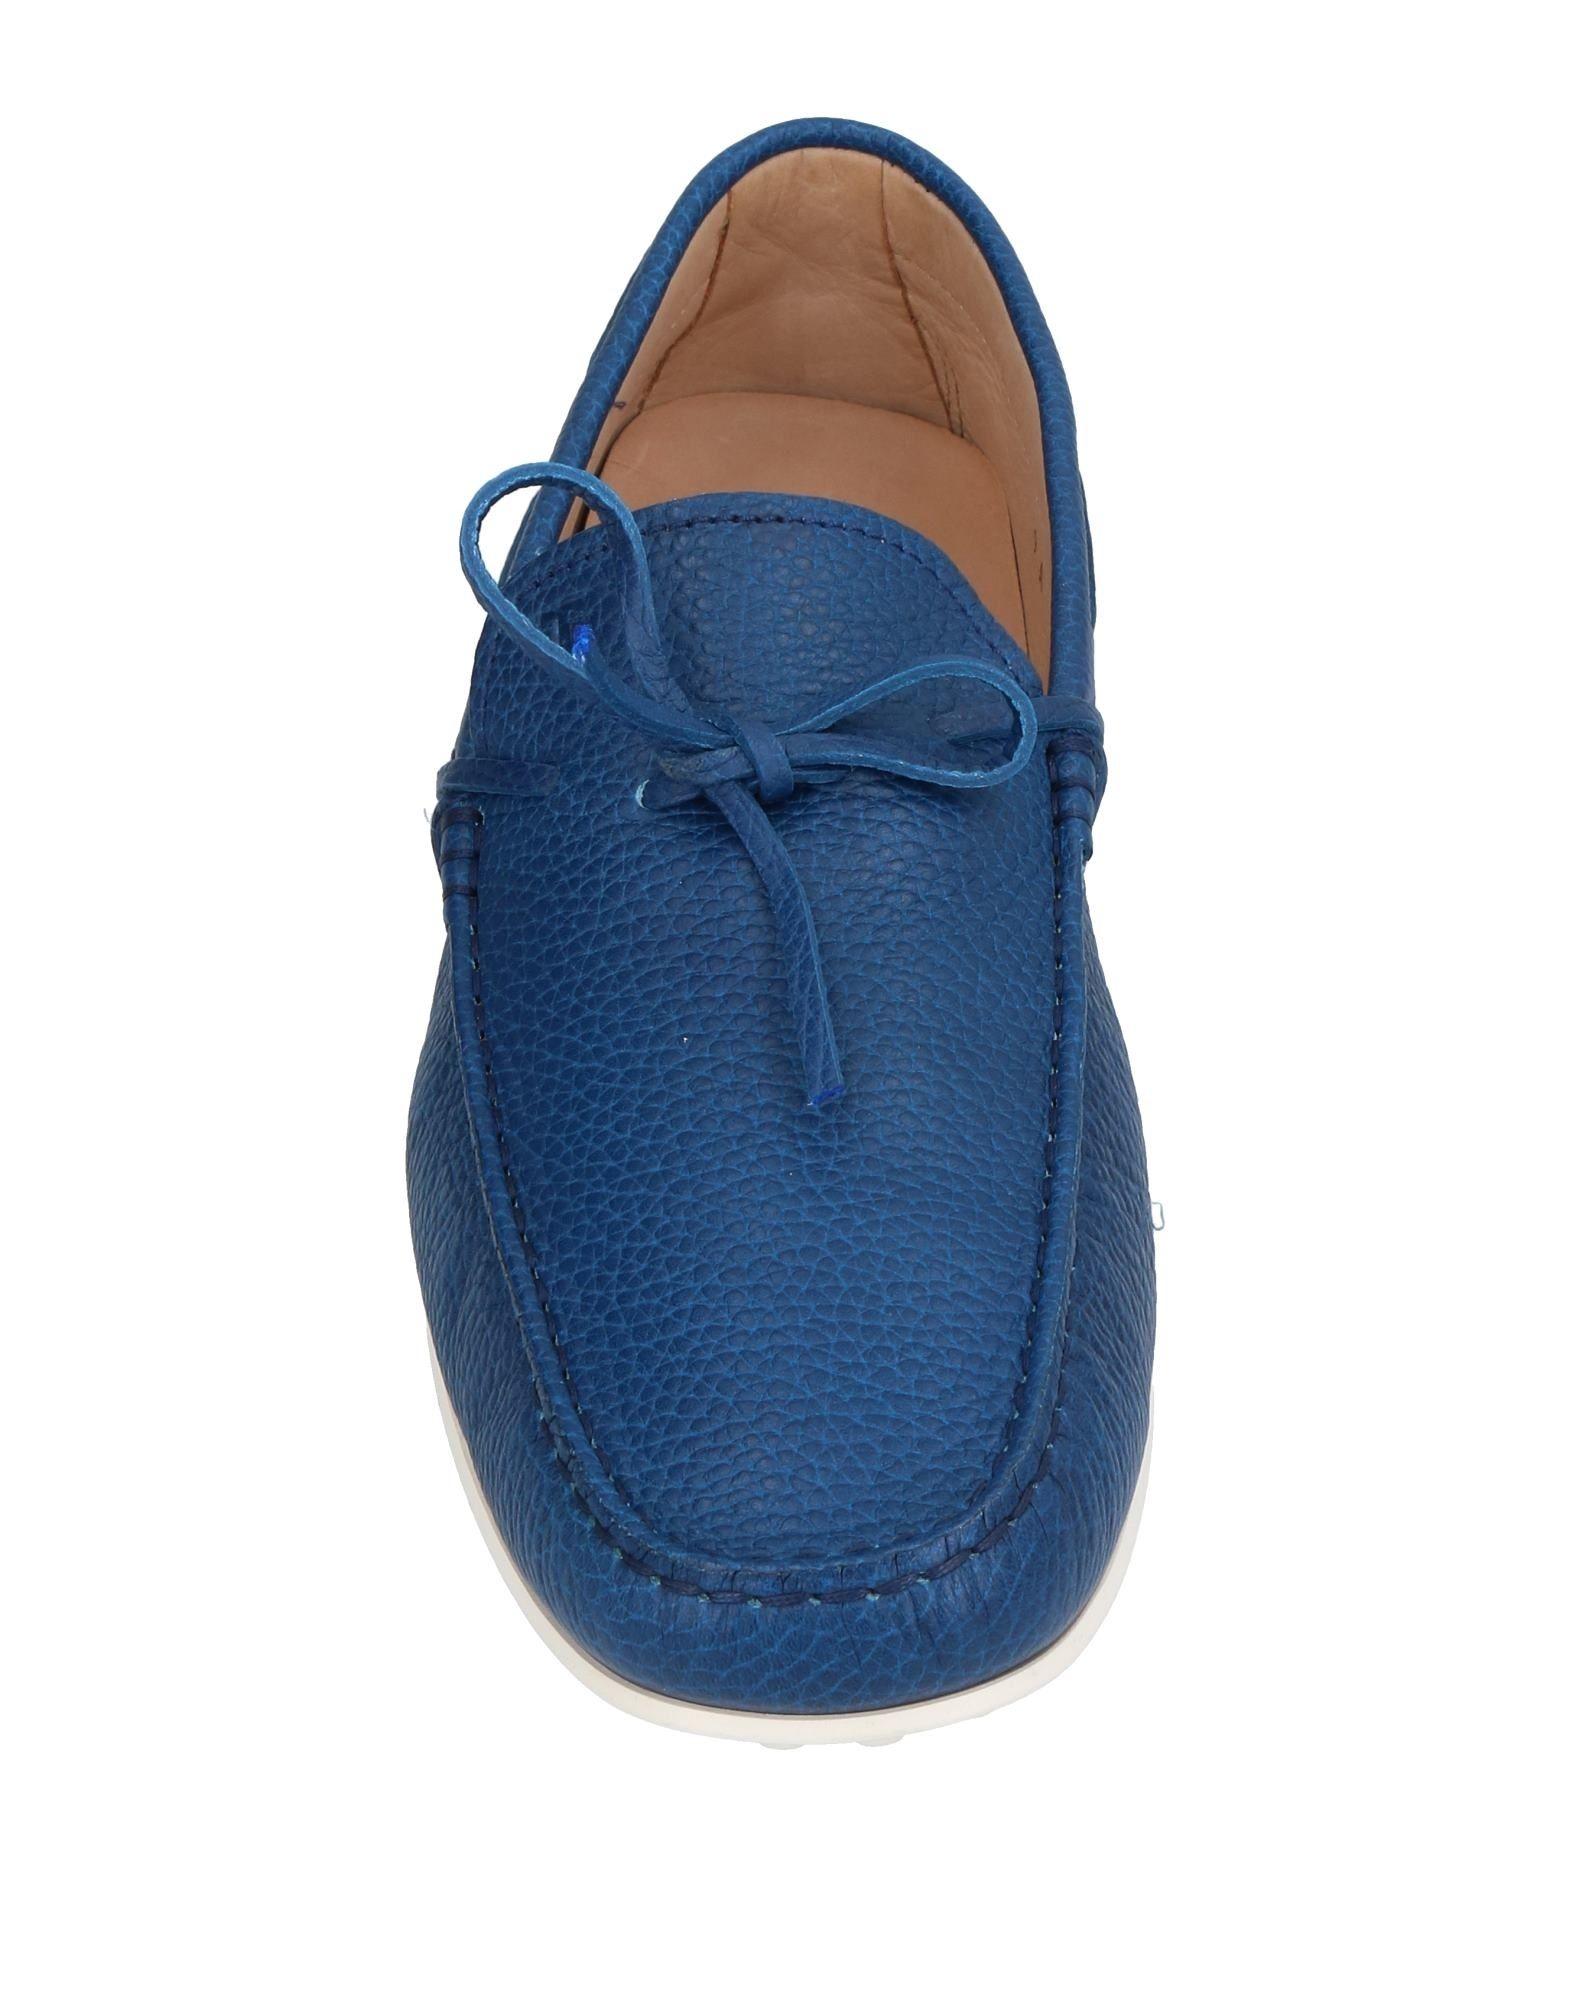 Tod's Mokassins Qualität Herren  11319299FX Gute Qualität Mokassins beliebte Schuhe 5b3046